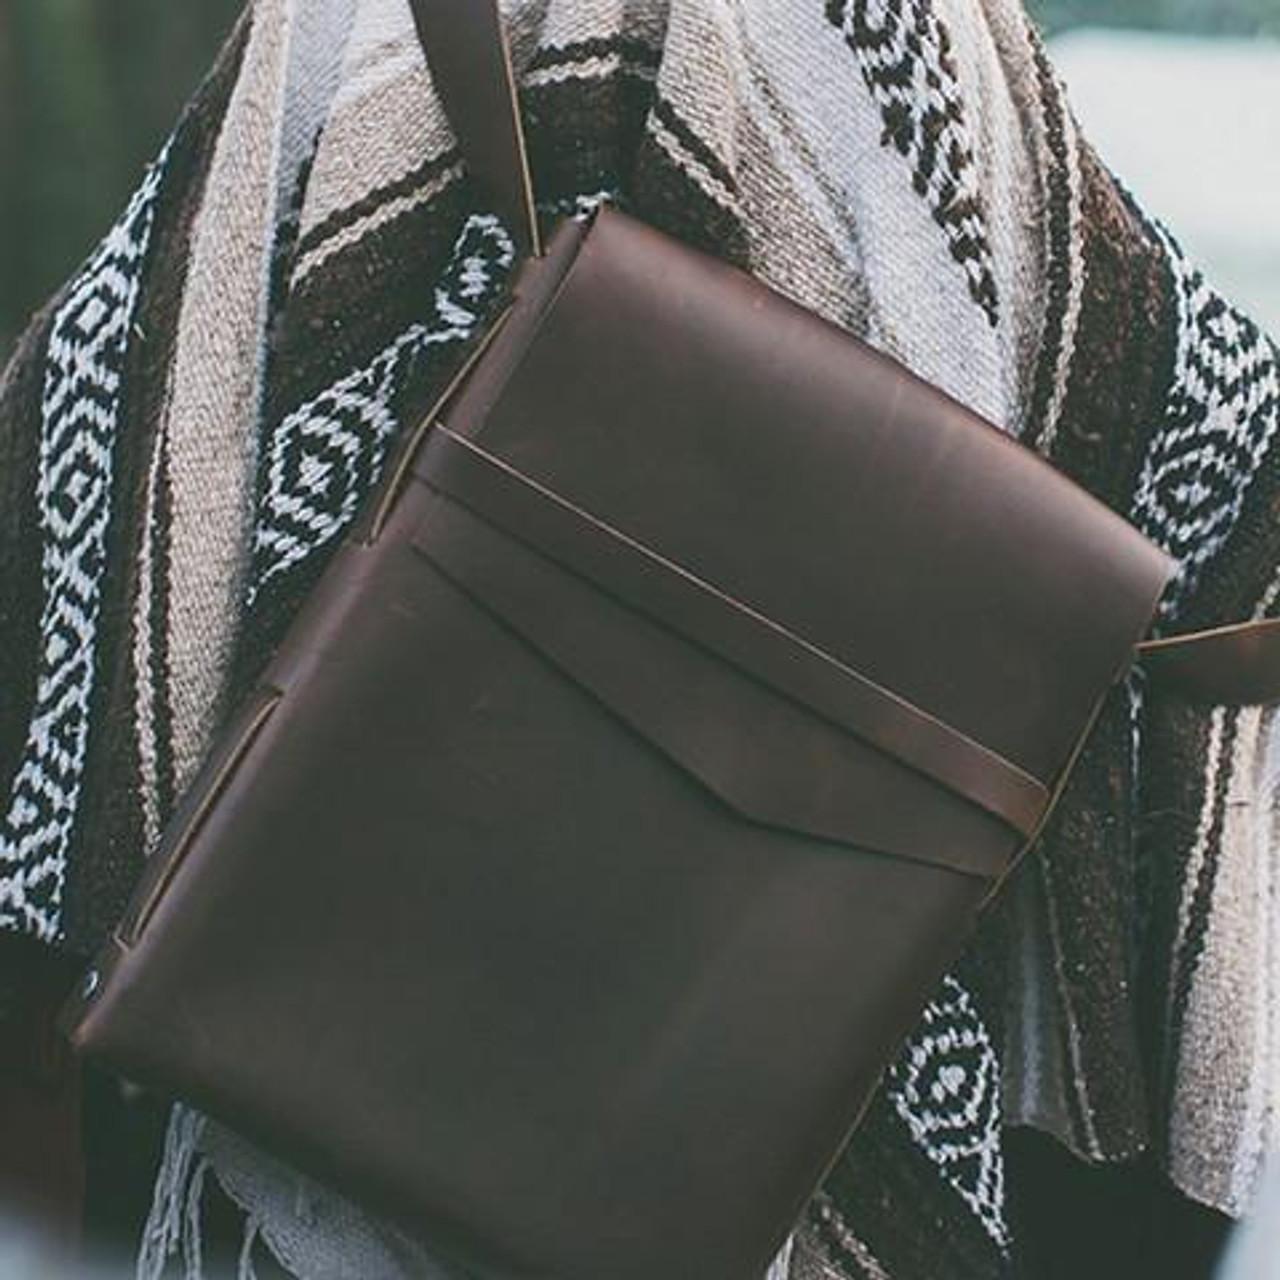 Leather Satchel - Explorer by Rustico - Dark Brown - Lifestyle